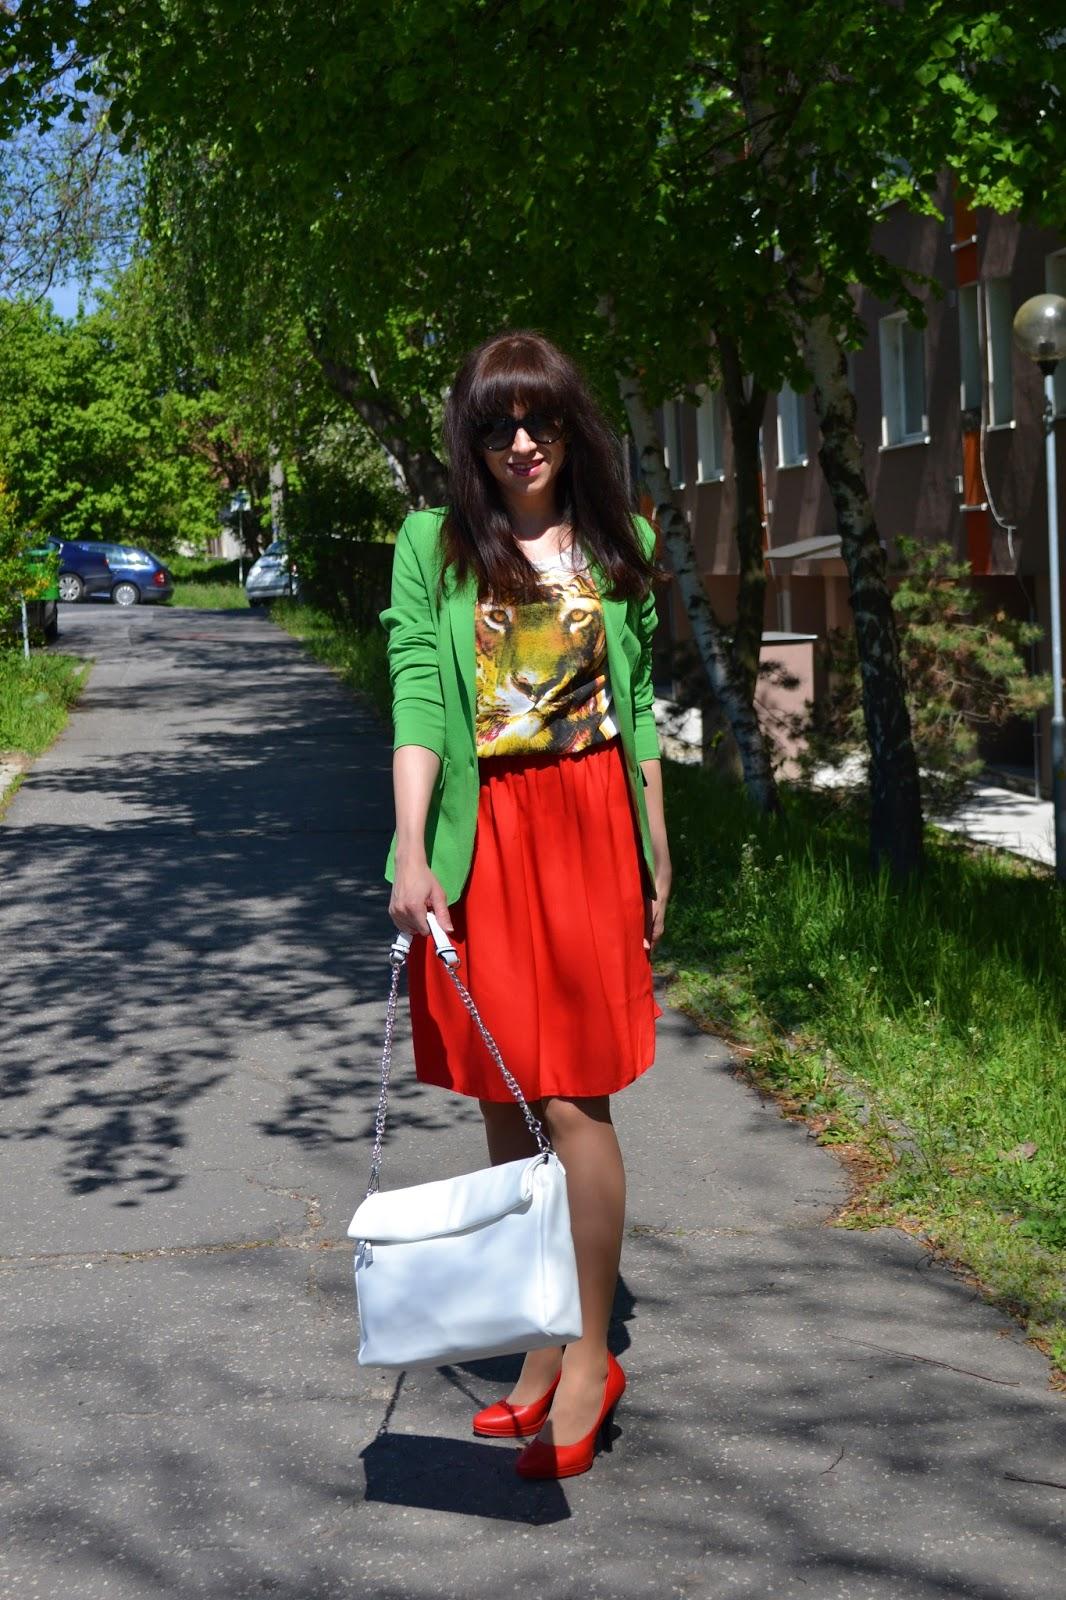 My cute tiger_Katharine - fashion is beautiful_Červené lodičky_Červená sukňa_Animal print_Katarína Jakubčová_Fashion blogger